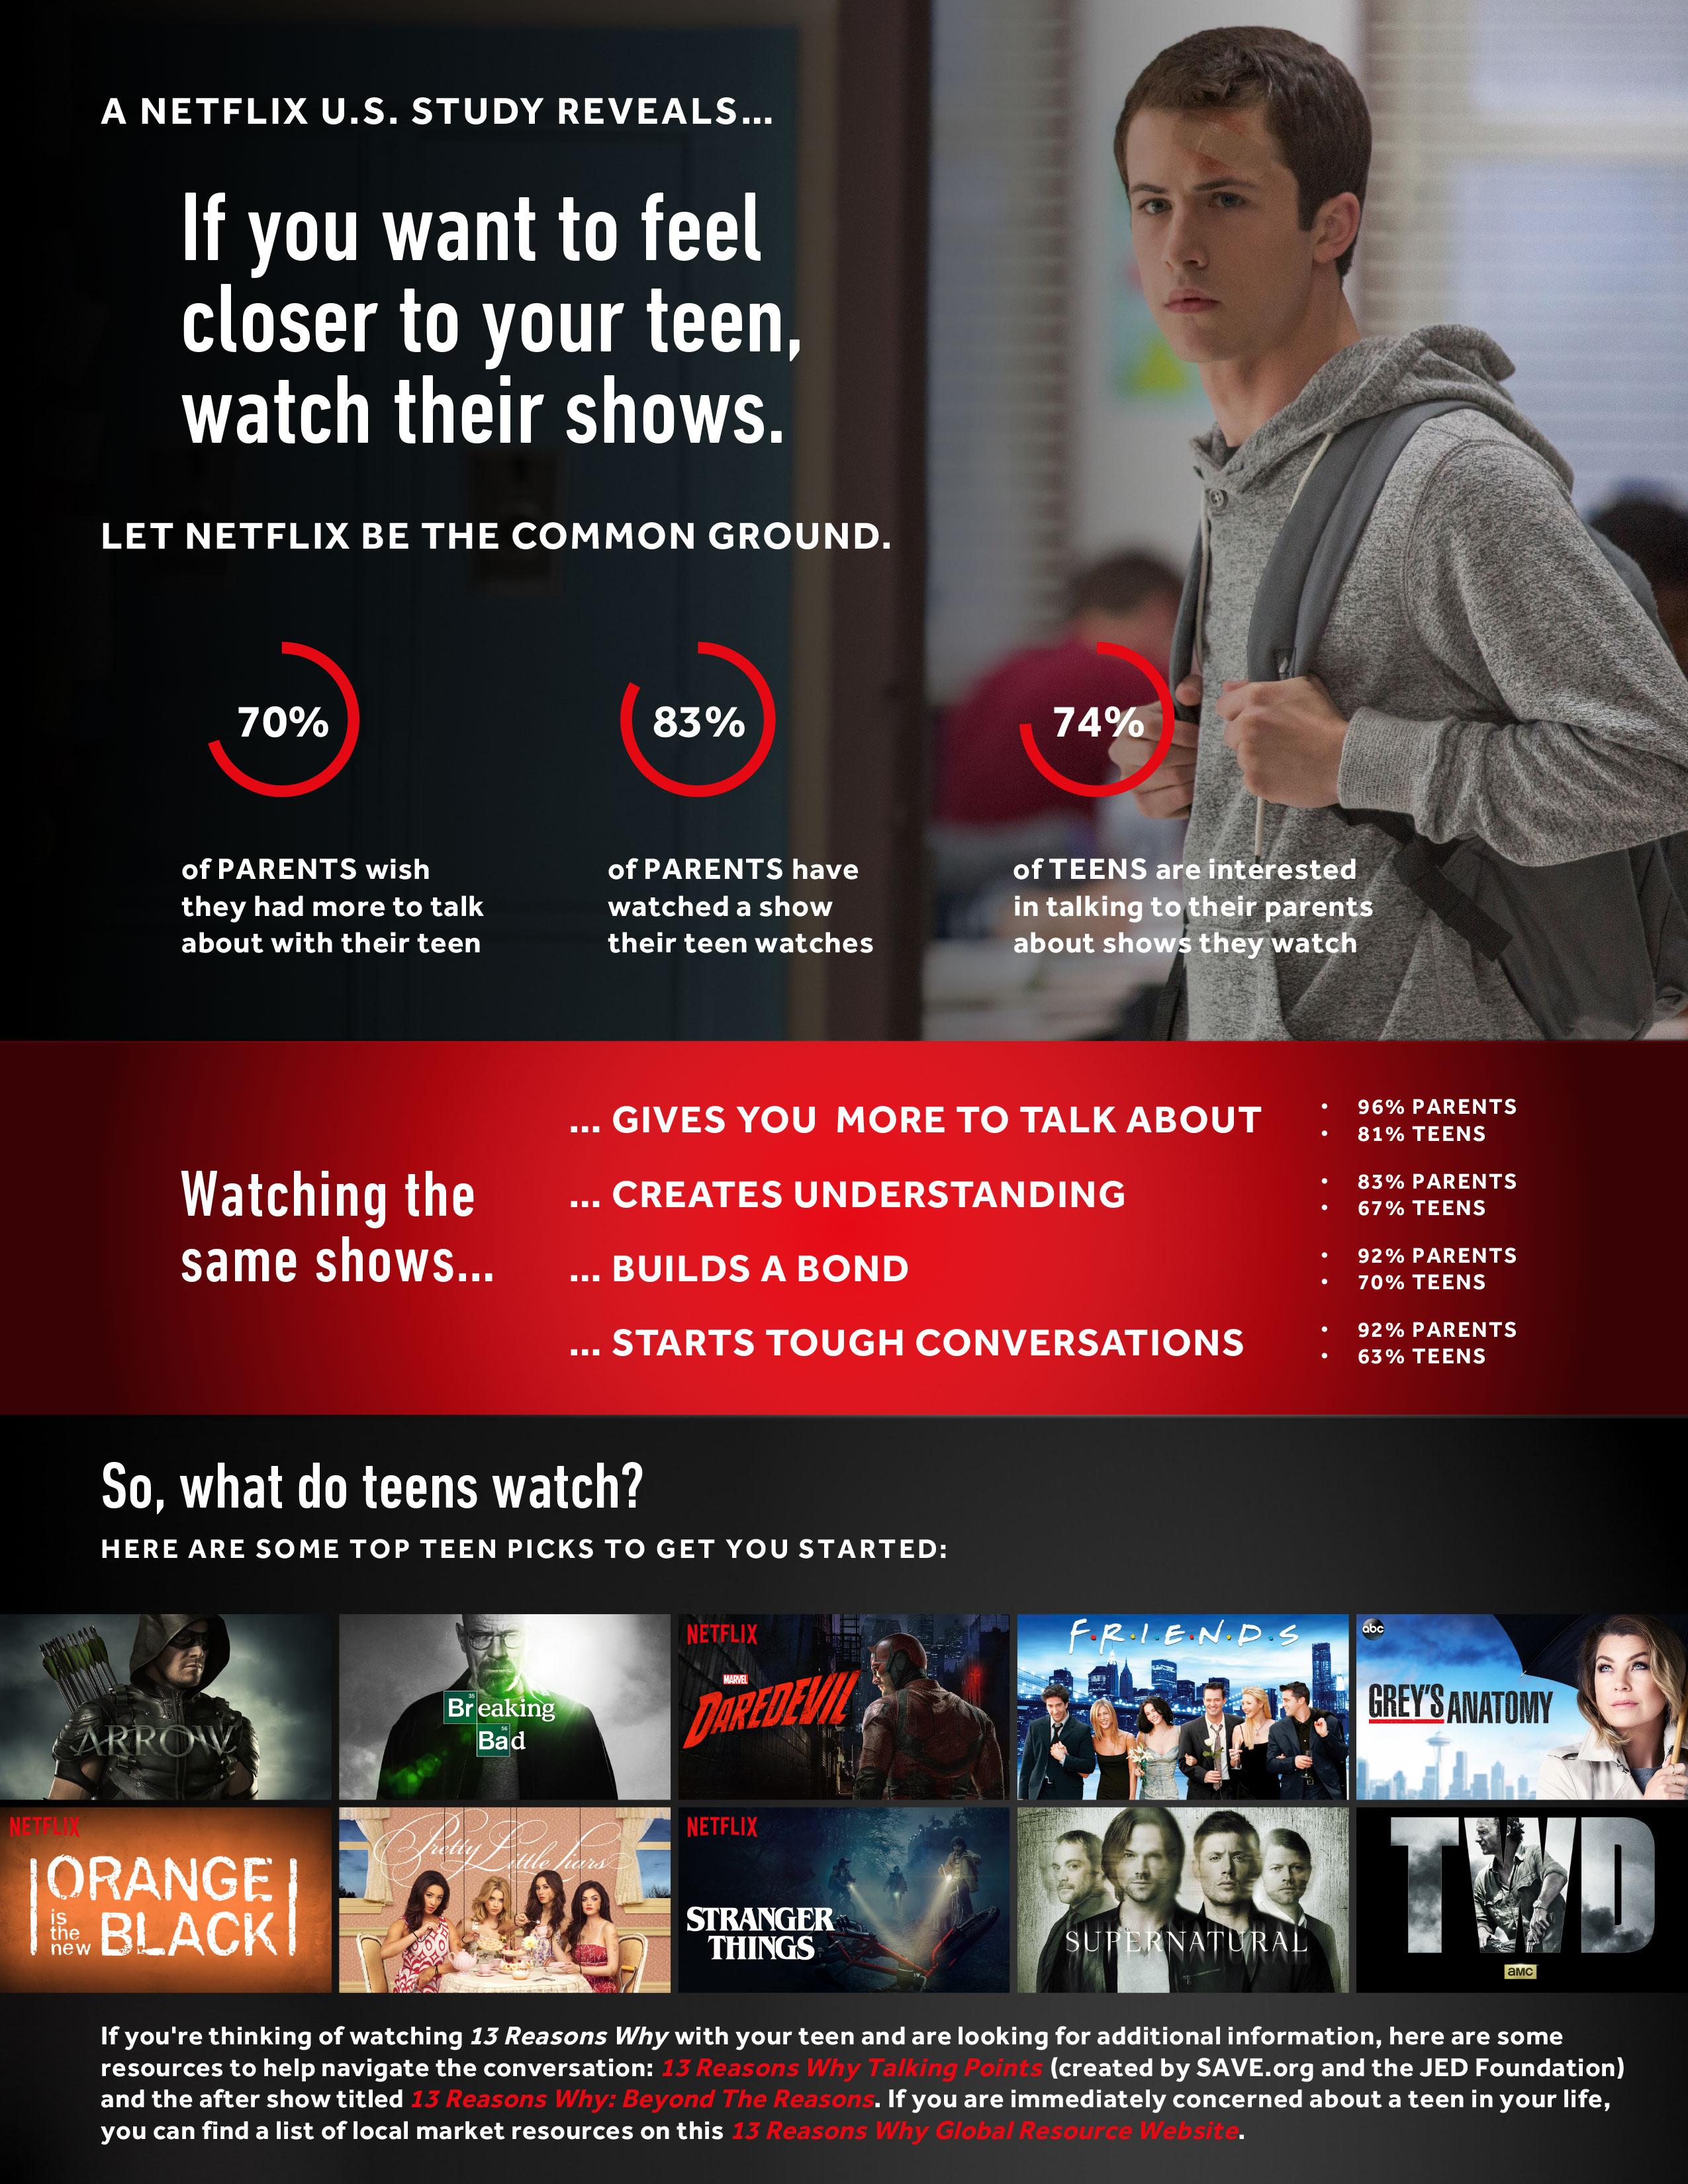 Netflix-US-Infographic